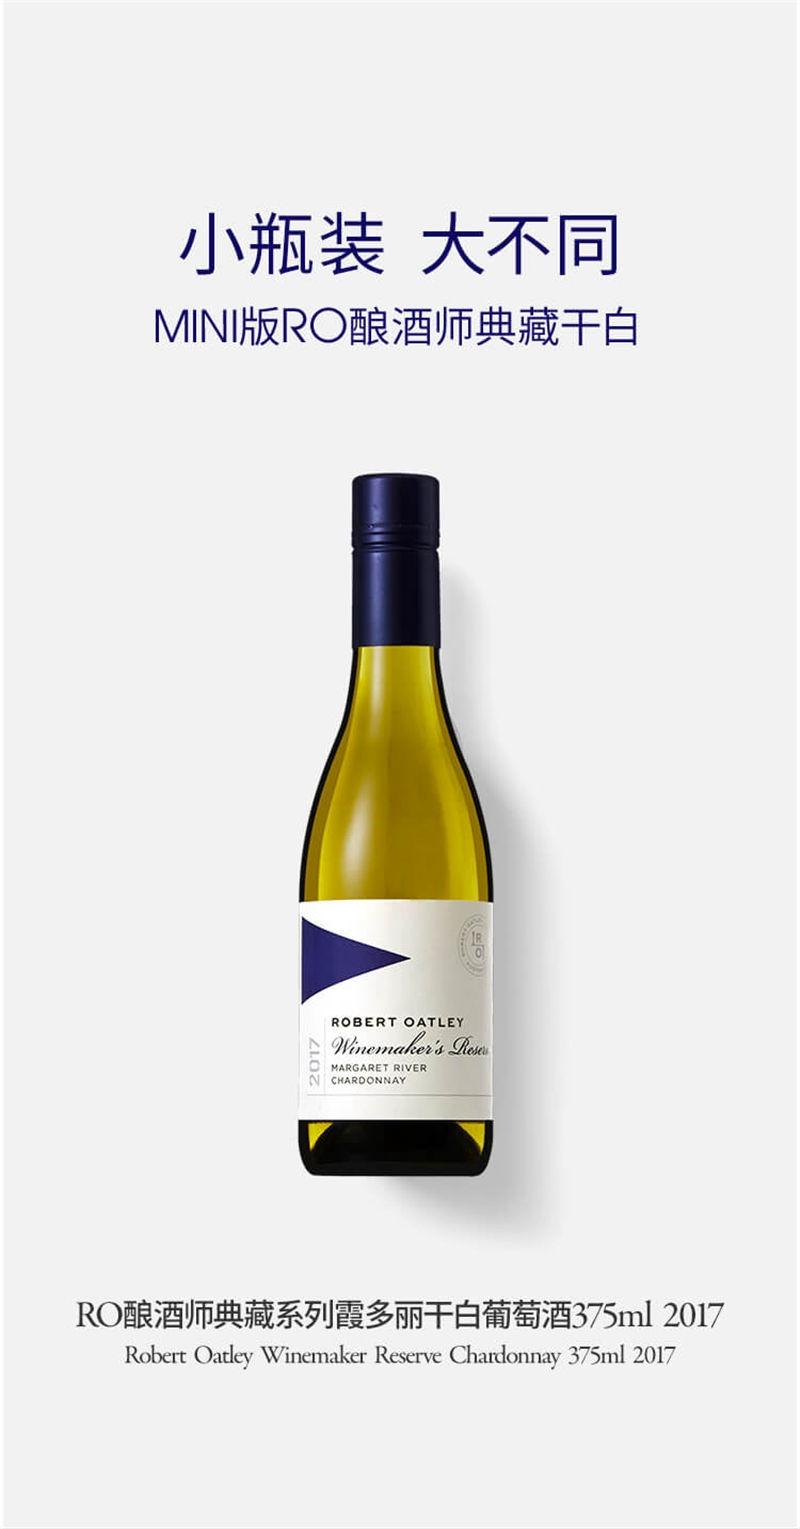 Robert Oatley mini酿酒师典藏霞多丽干白葡萄酒酒375ml*6瓶 信息